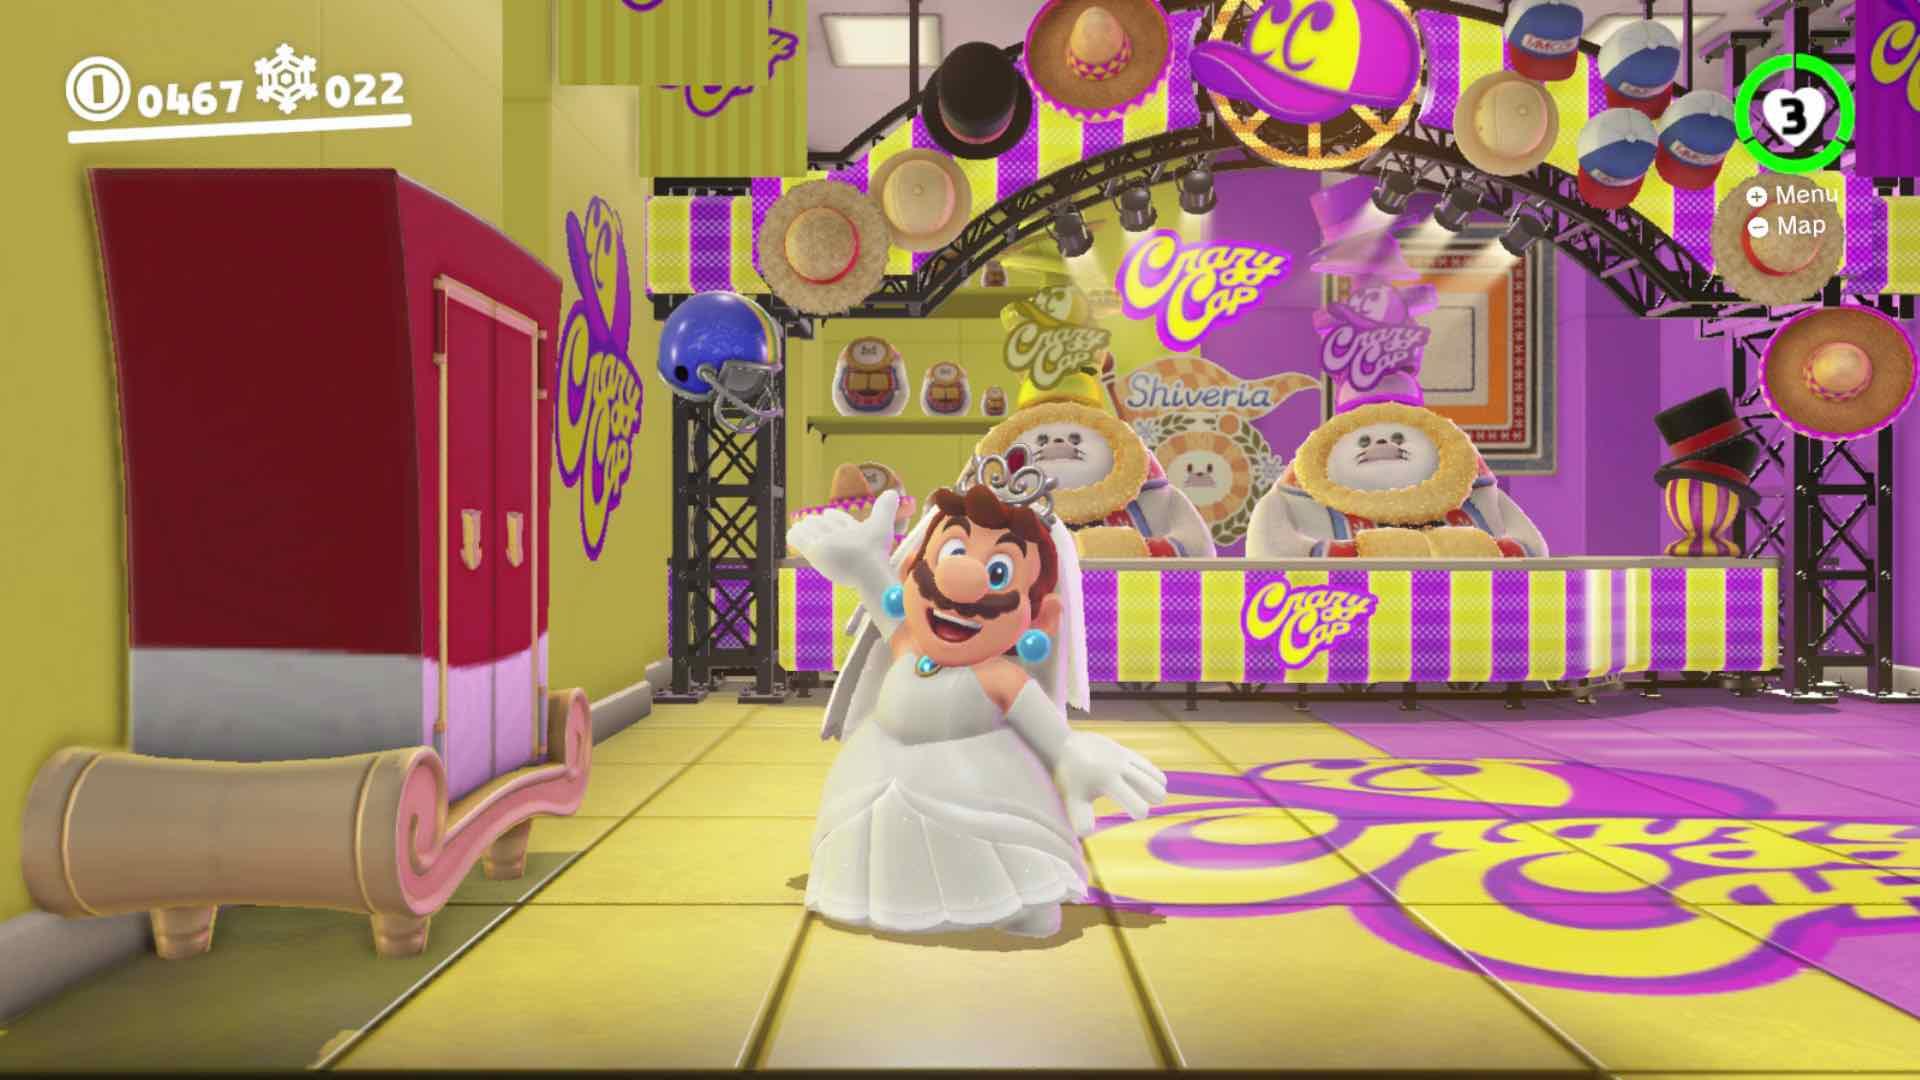 bridal-gown-super-mario-odyssey-screenshot